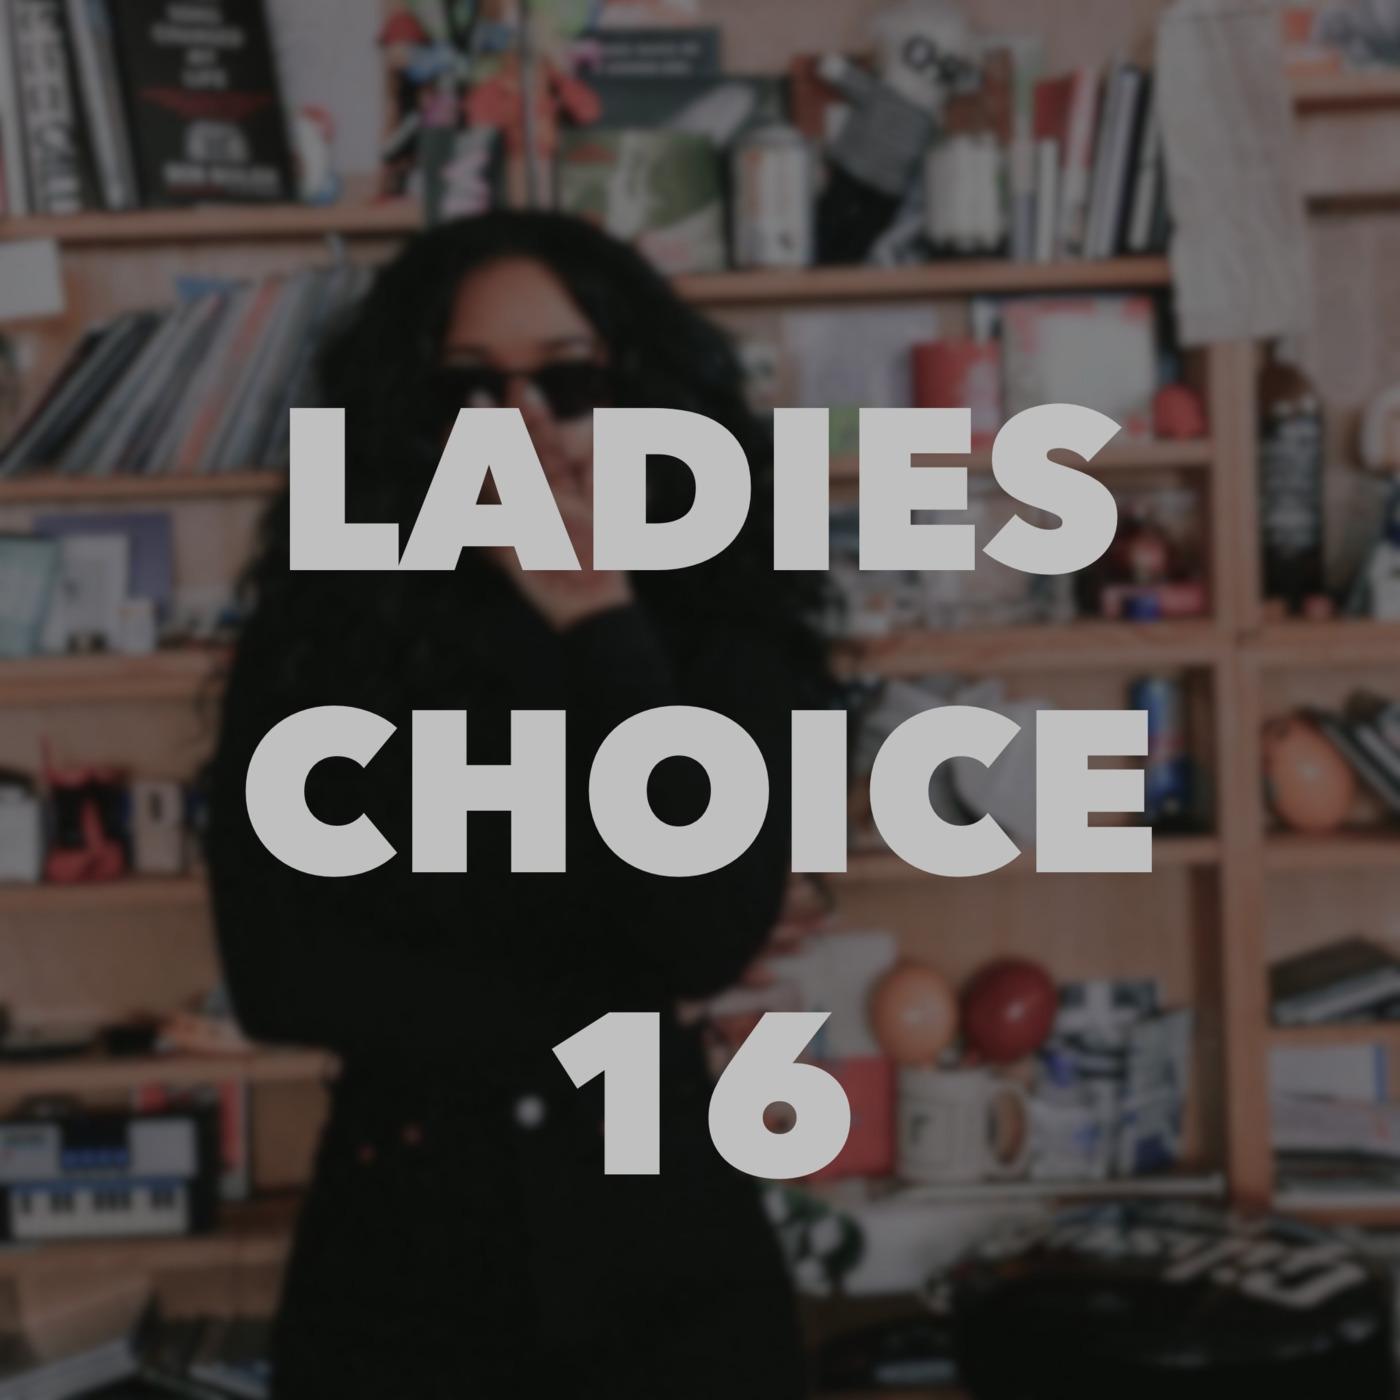 LADIES CHOICE 16 Dj Crown Prince podcast